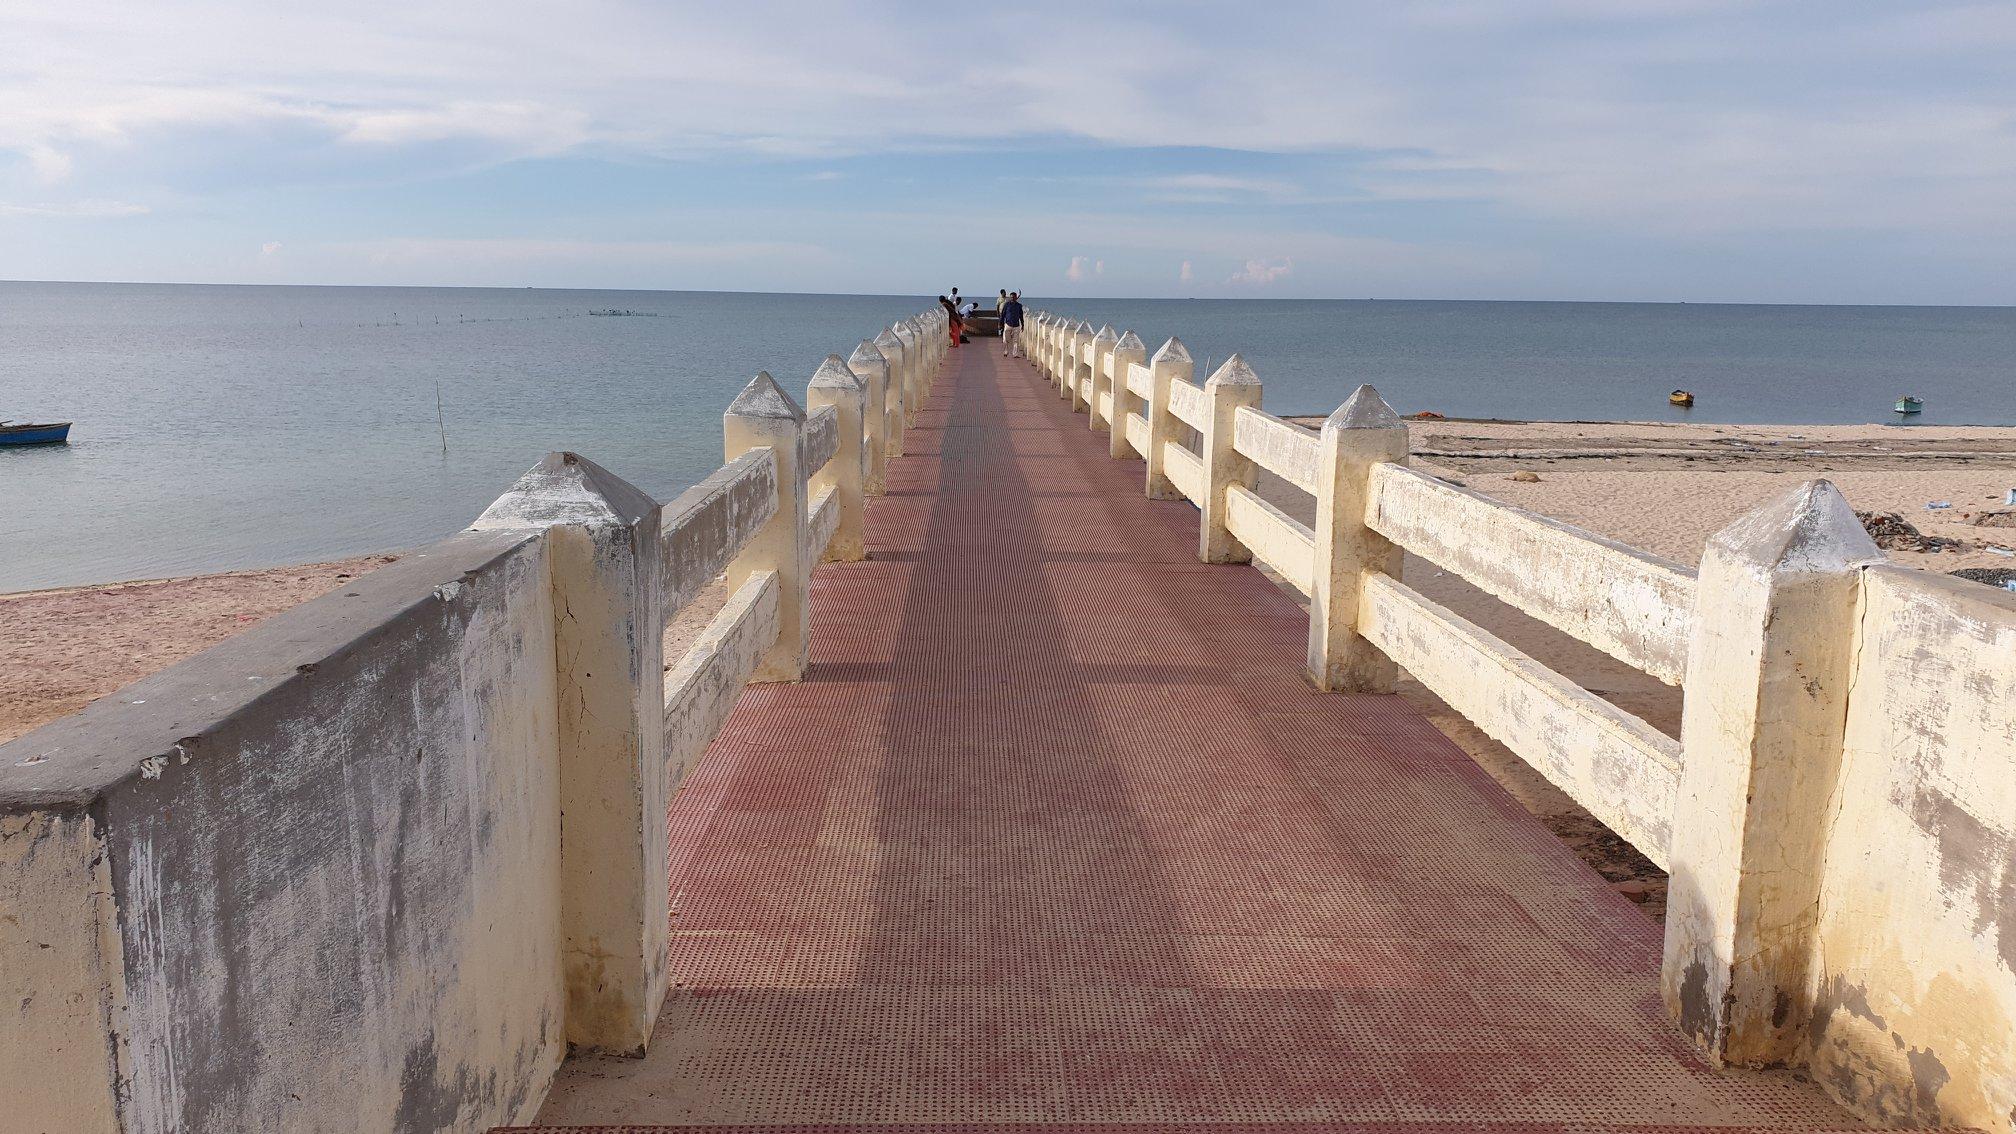 The little bridge into the sea- Villondi Theertham near Rameswaram